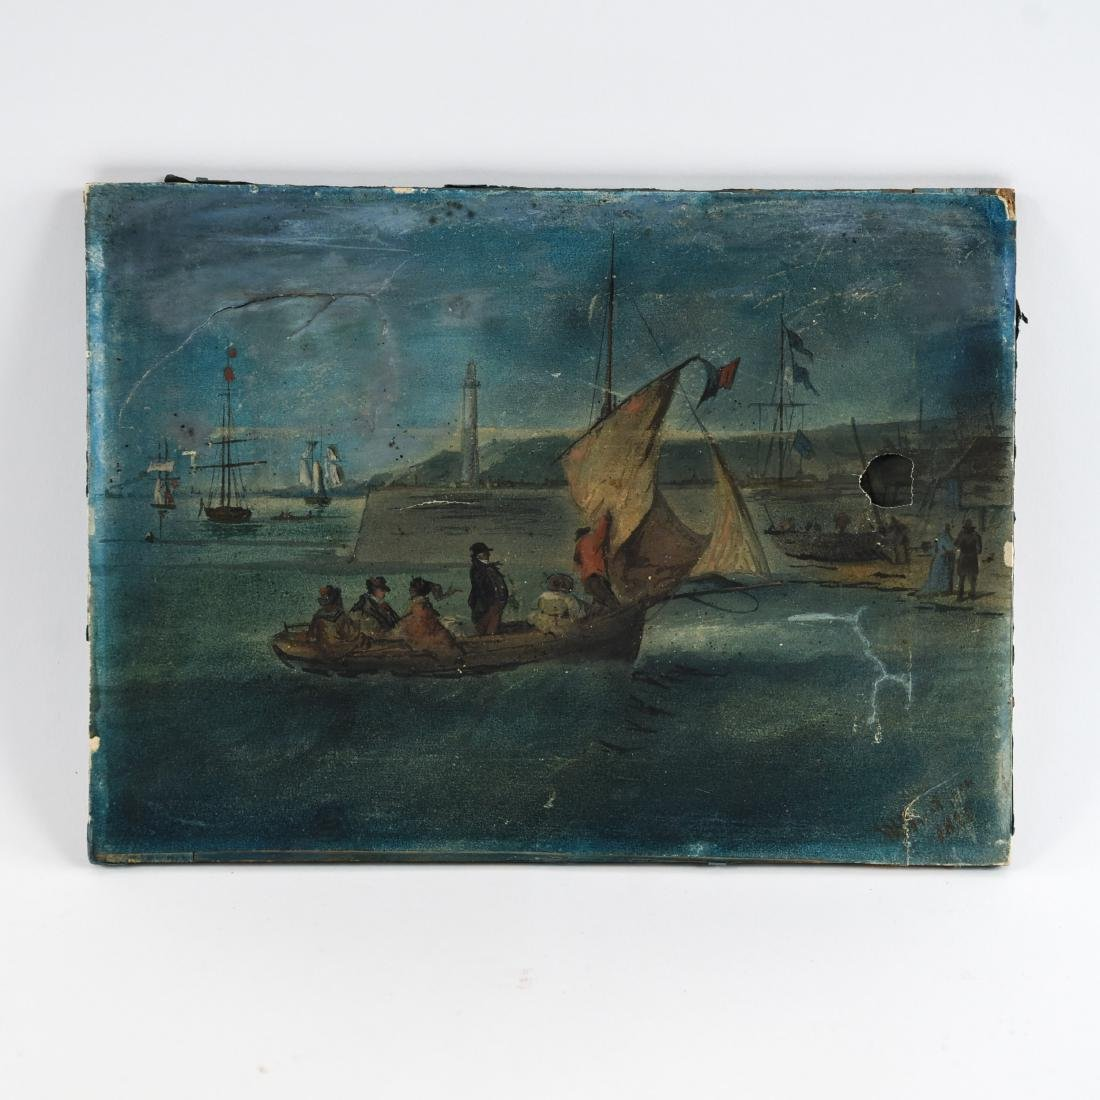 19TH C. SEASCAPE OIL ON PAPER